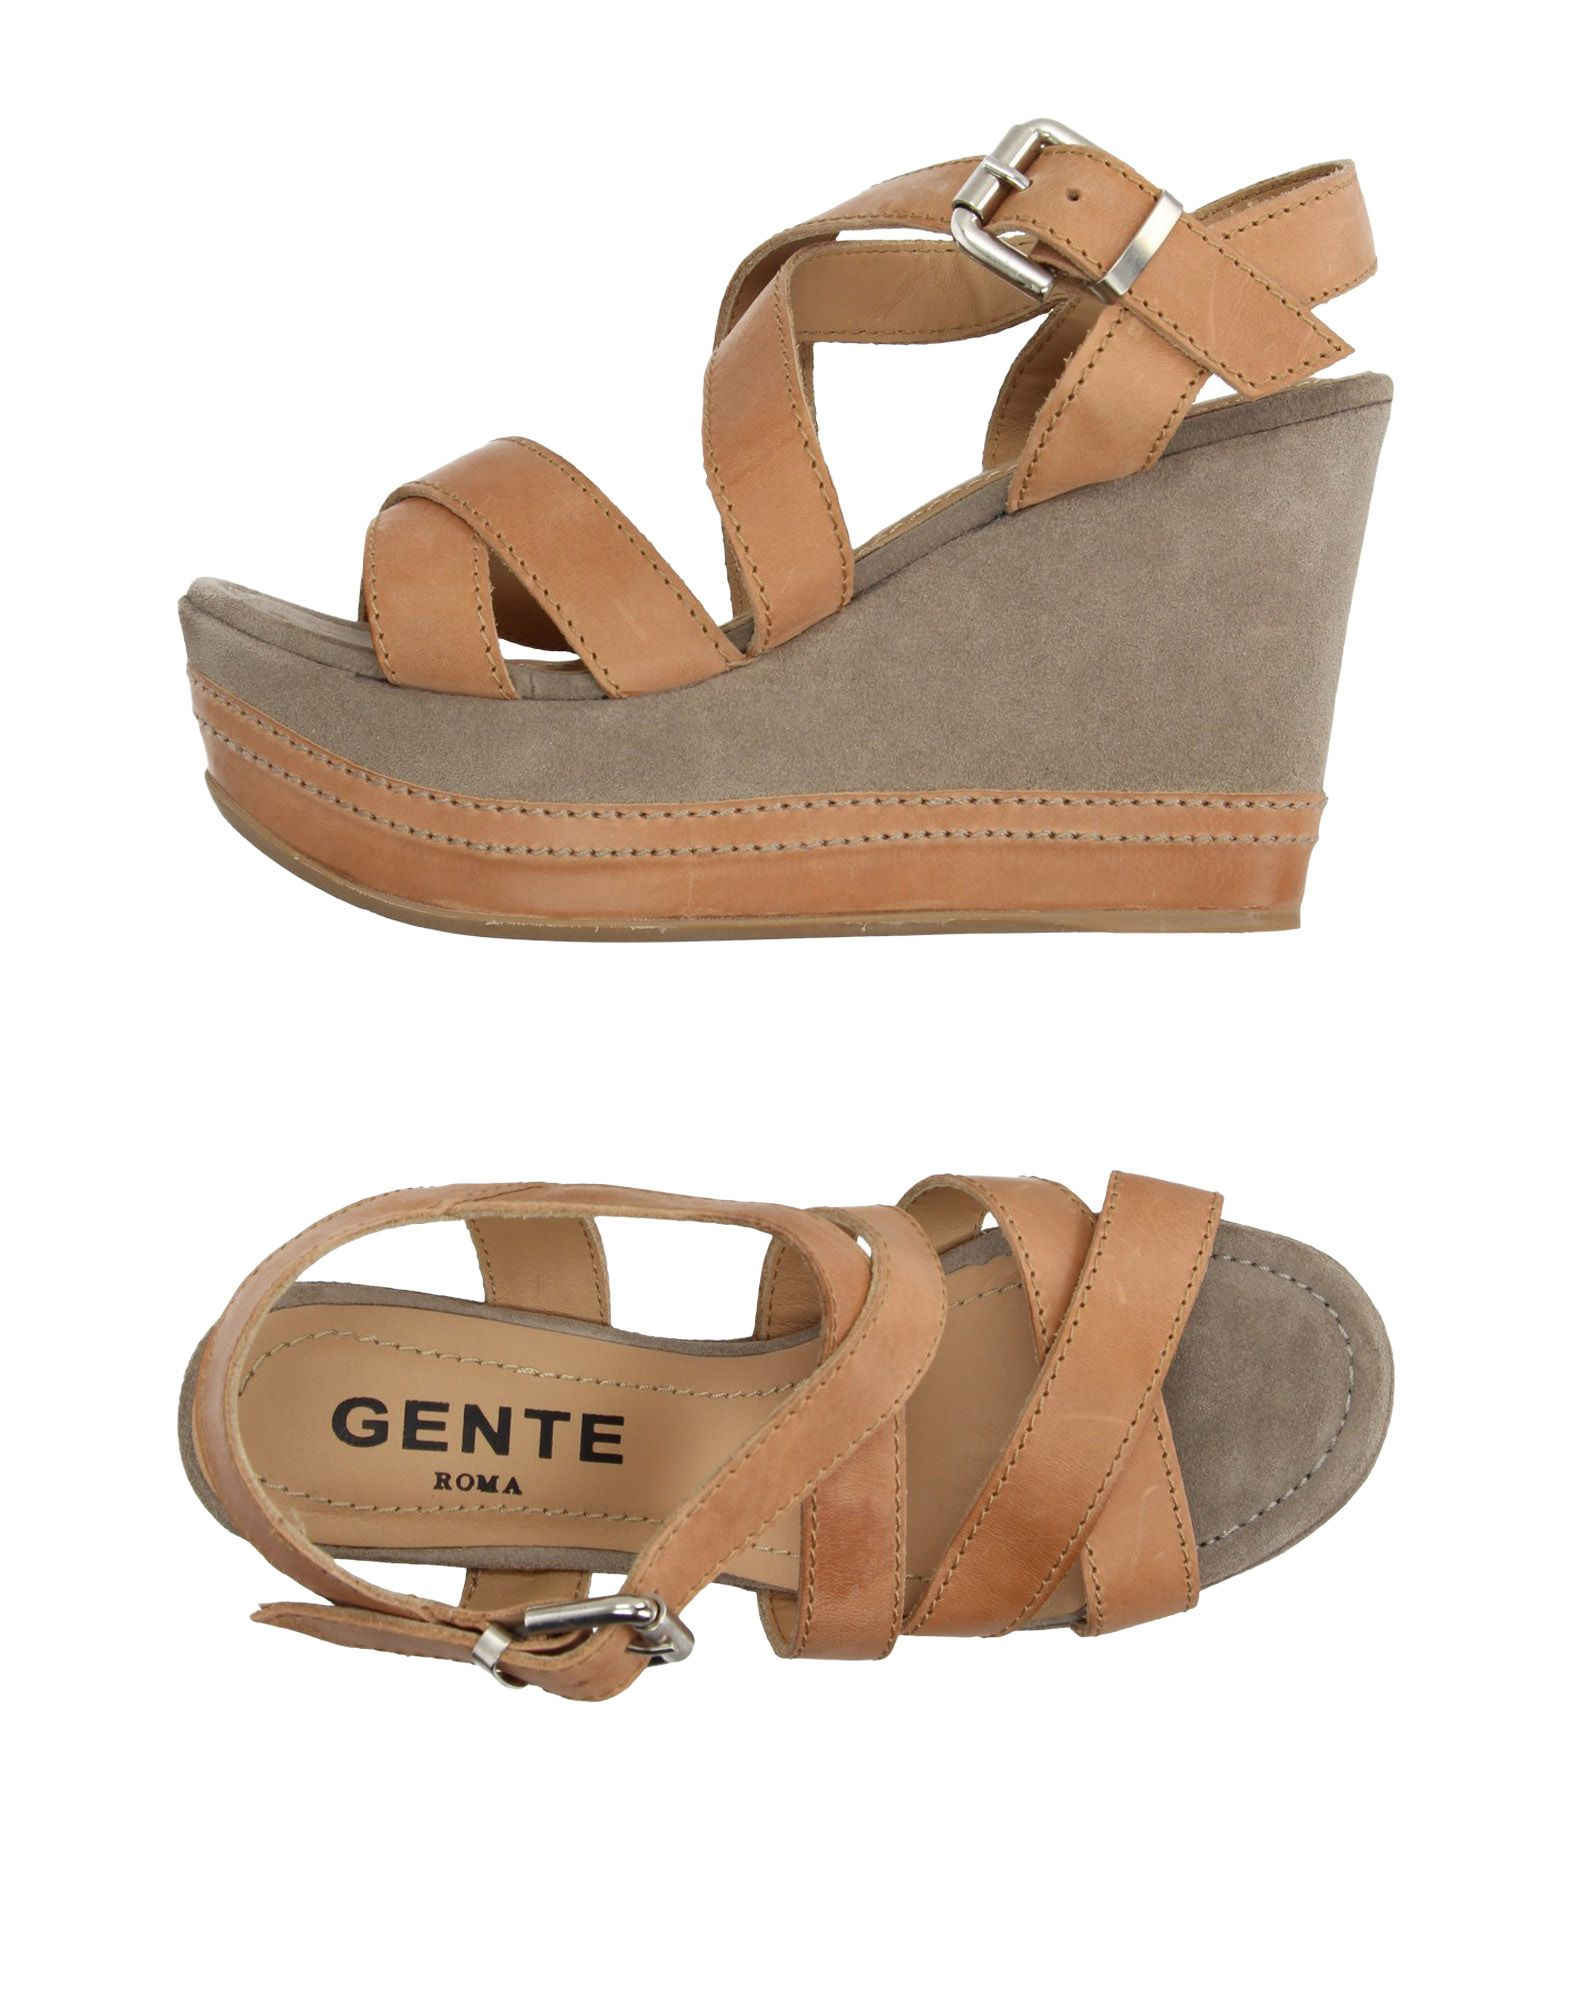 Sandales Gente Roma Femme - Sandales Gente Roma sur